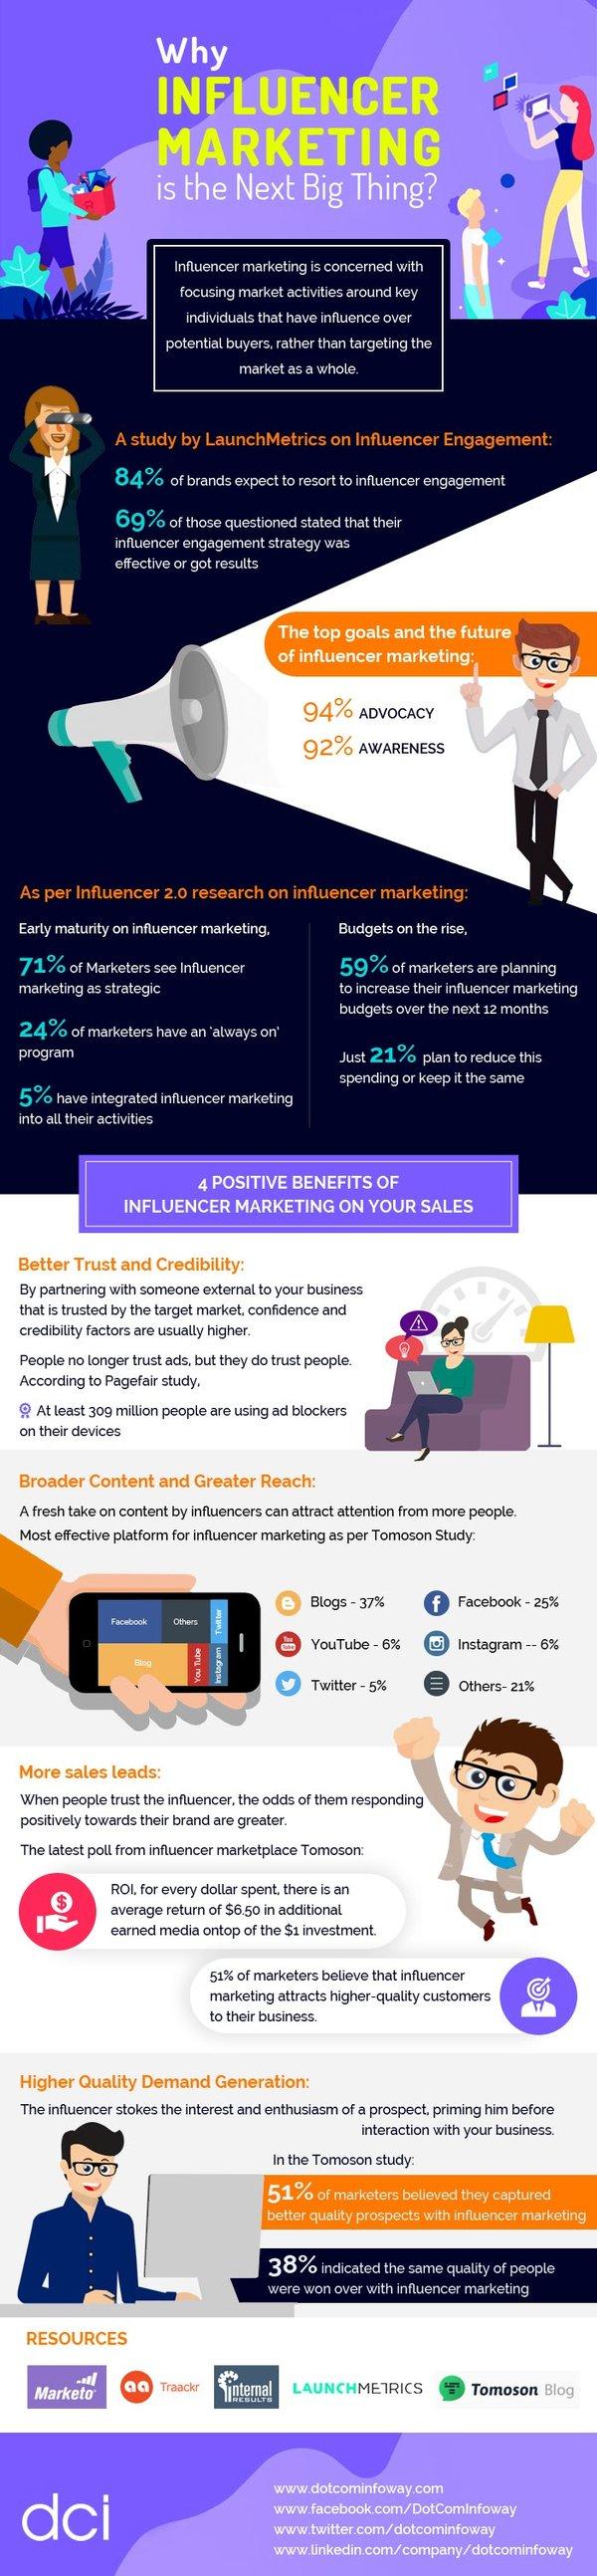 Influencer-Marketing-Infographic - Copy